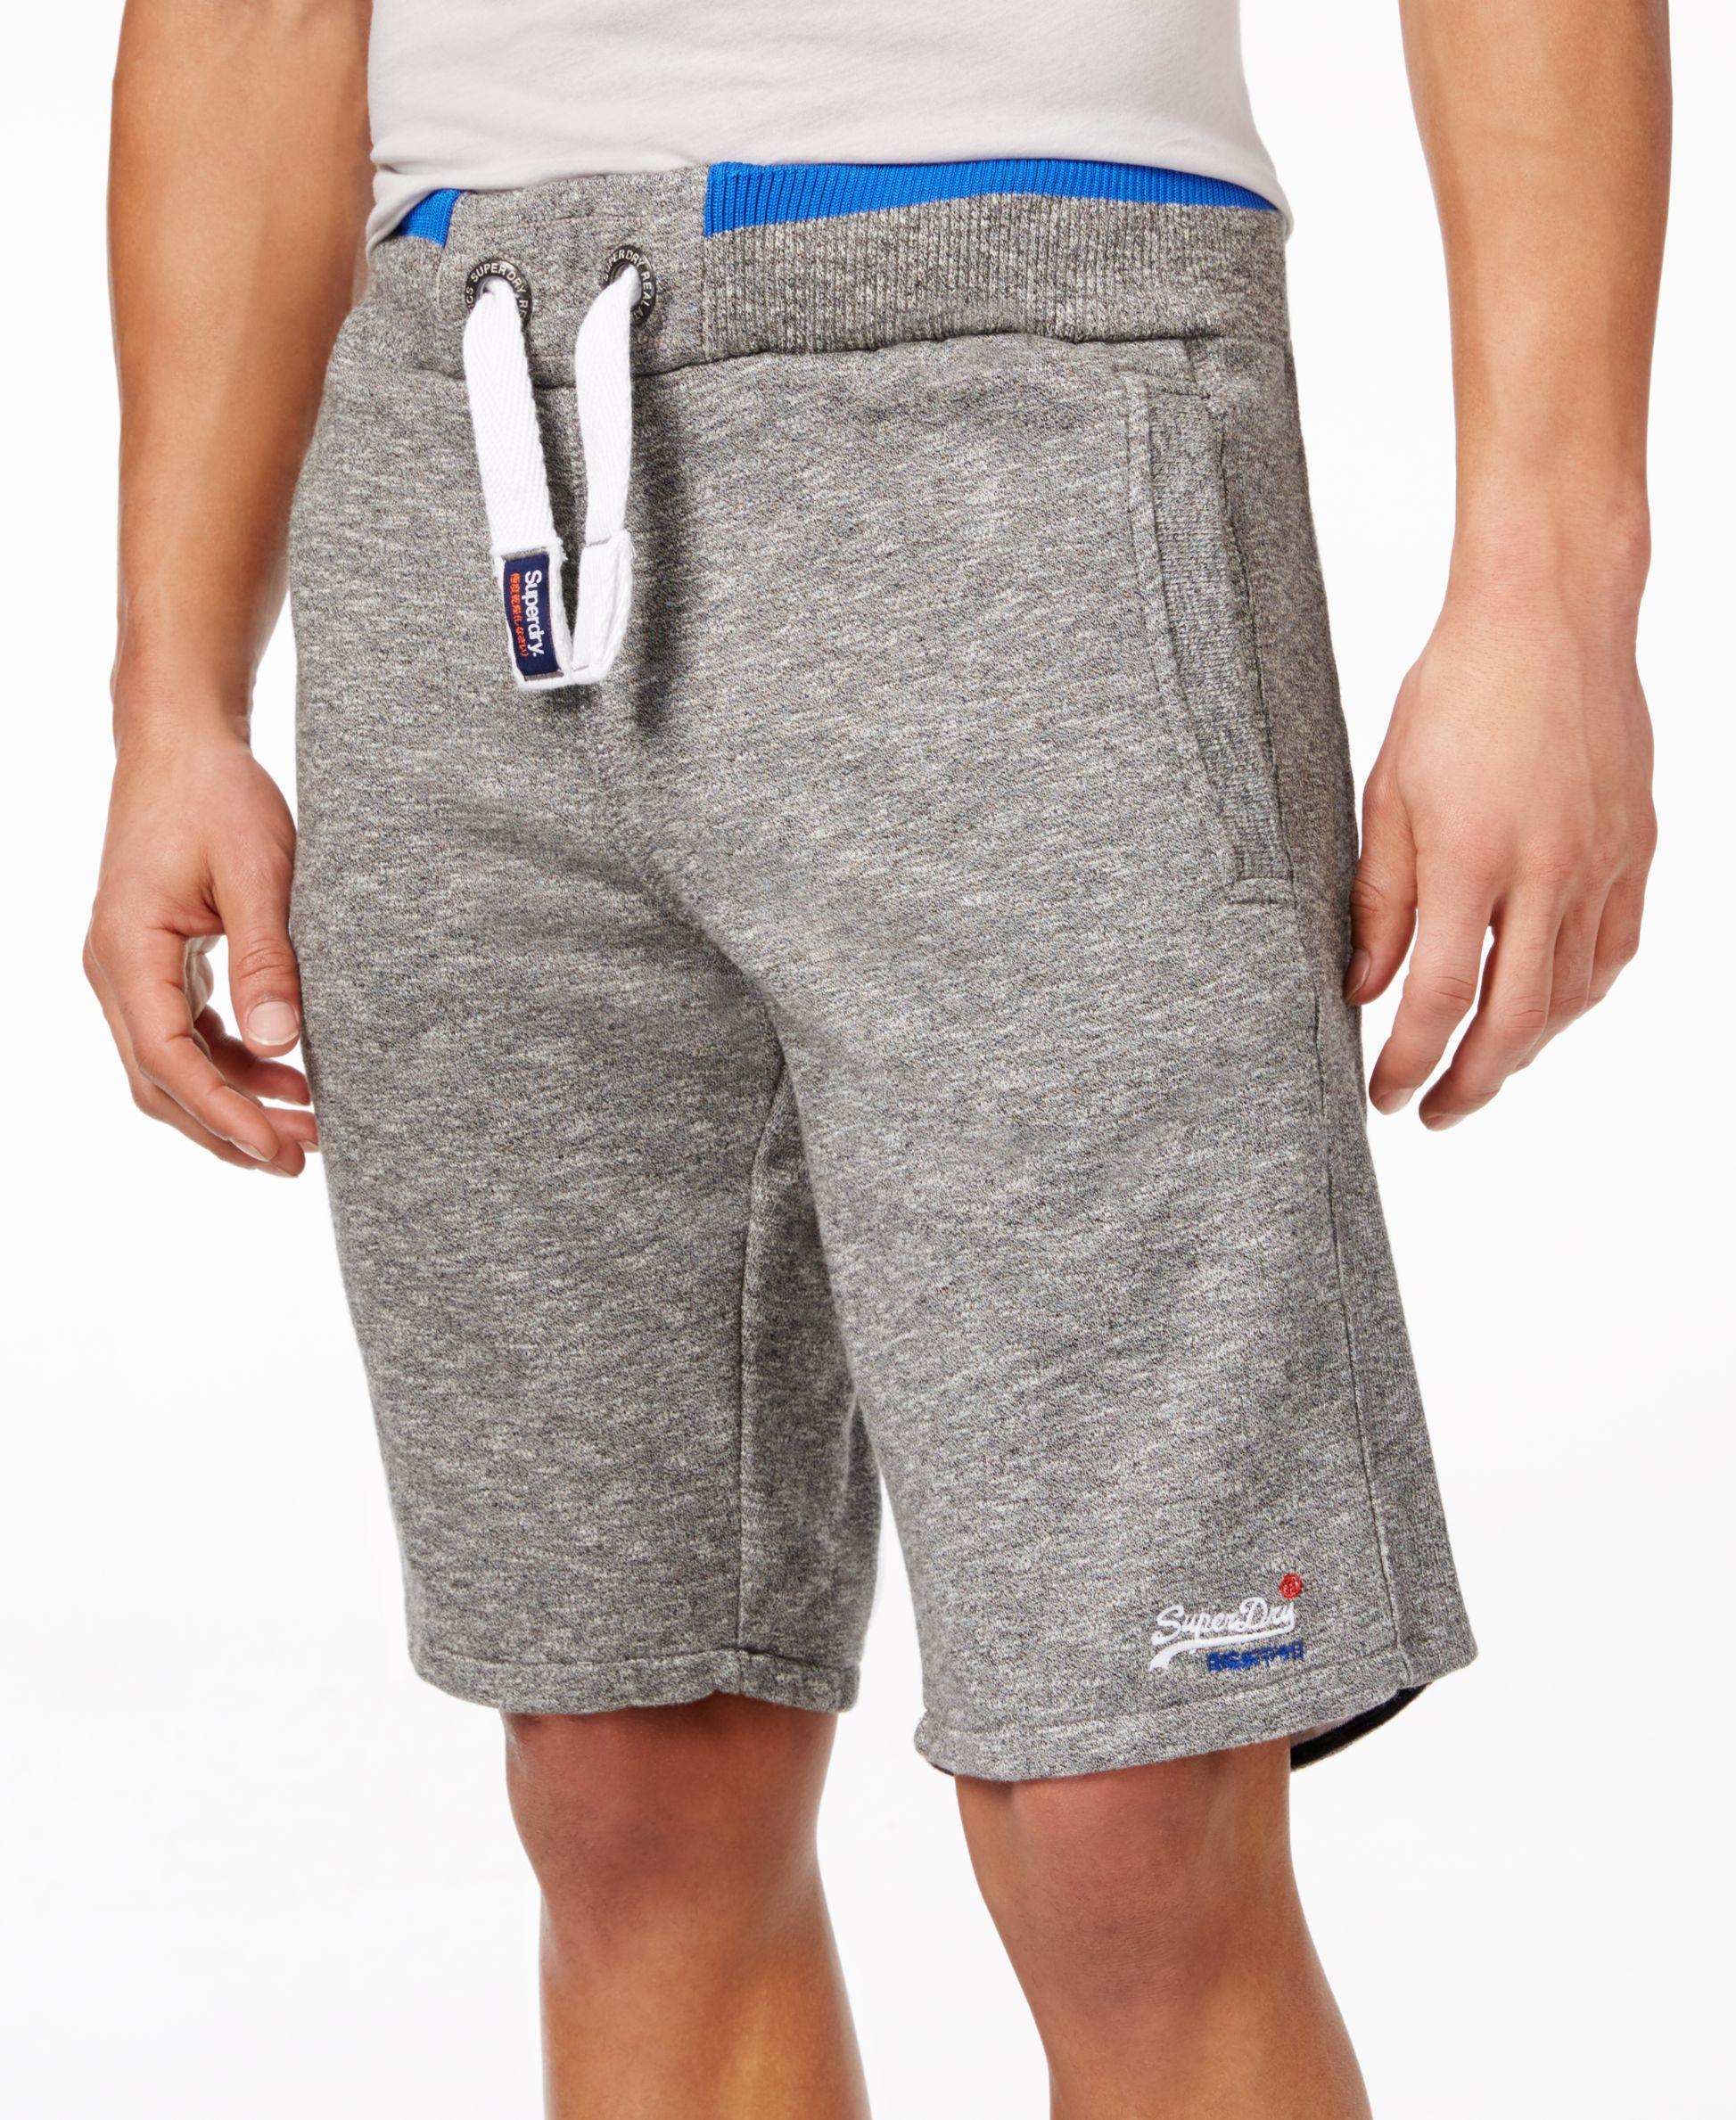 53d941bdbadc2 Superdry Men s Orange Label True Grit Shorts